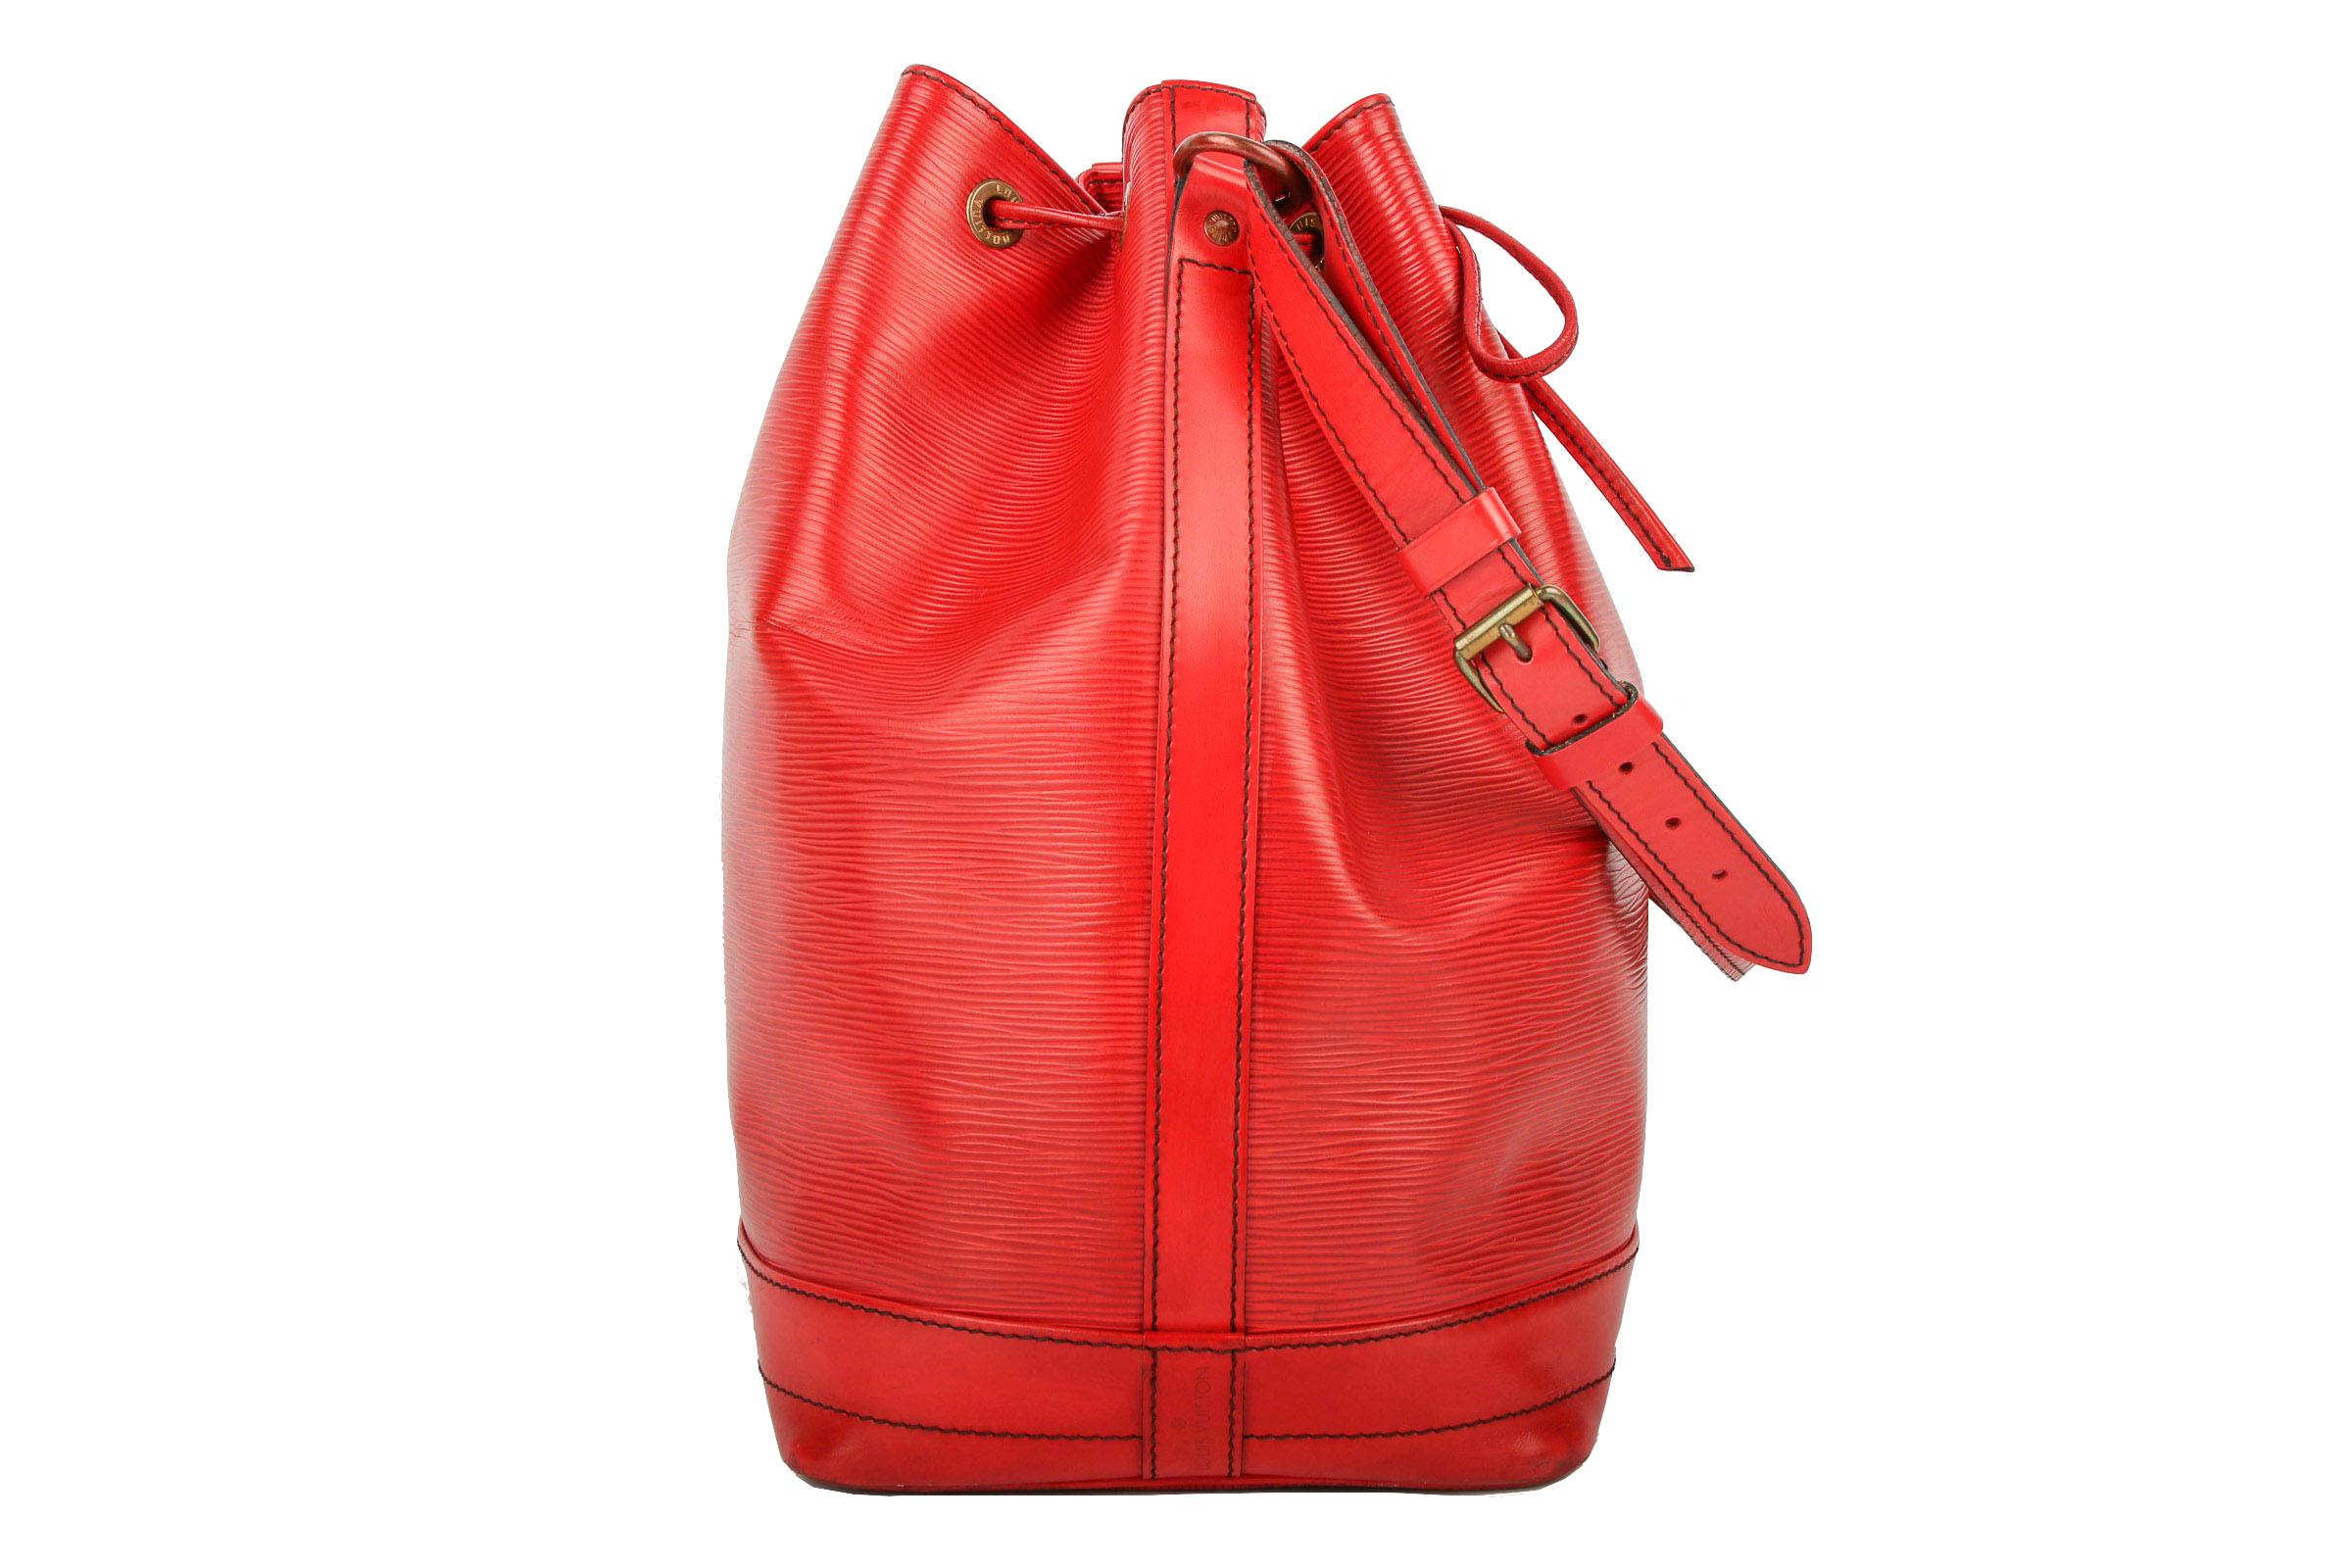 94714545c0070 Preview  Louis Vuitton Sac Noé Grand Epi Leder Rot. Preview  Louis Vuitton  Sac Noé Grand Epi Leder Rot